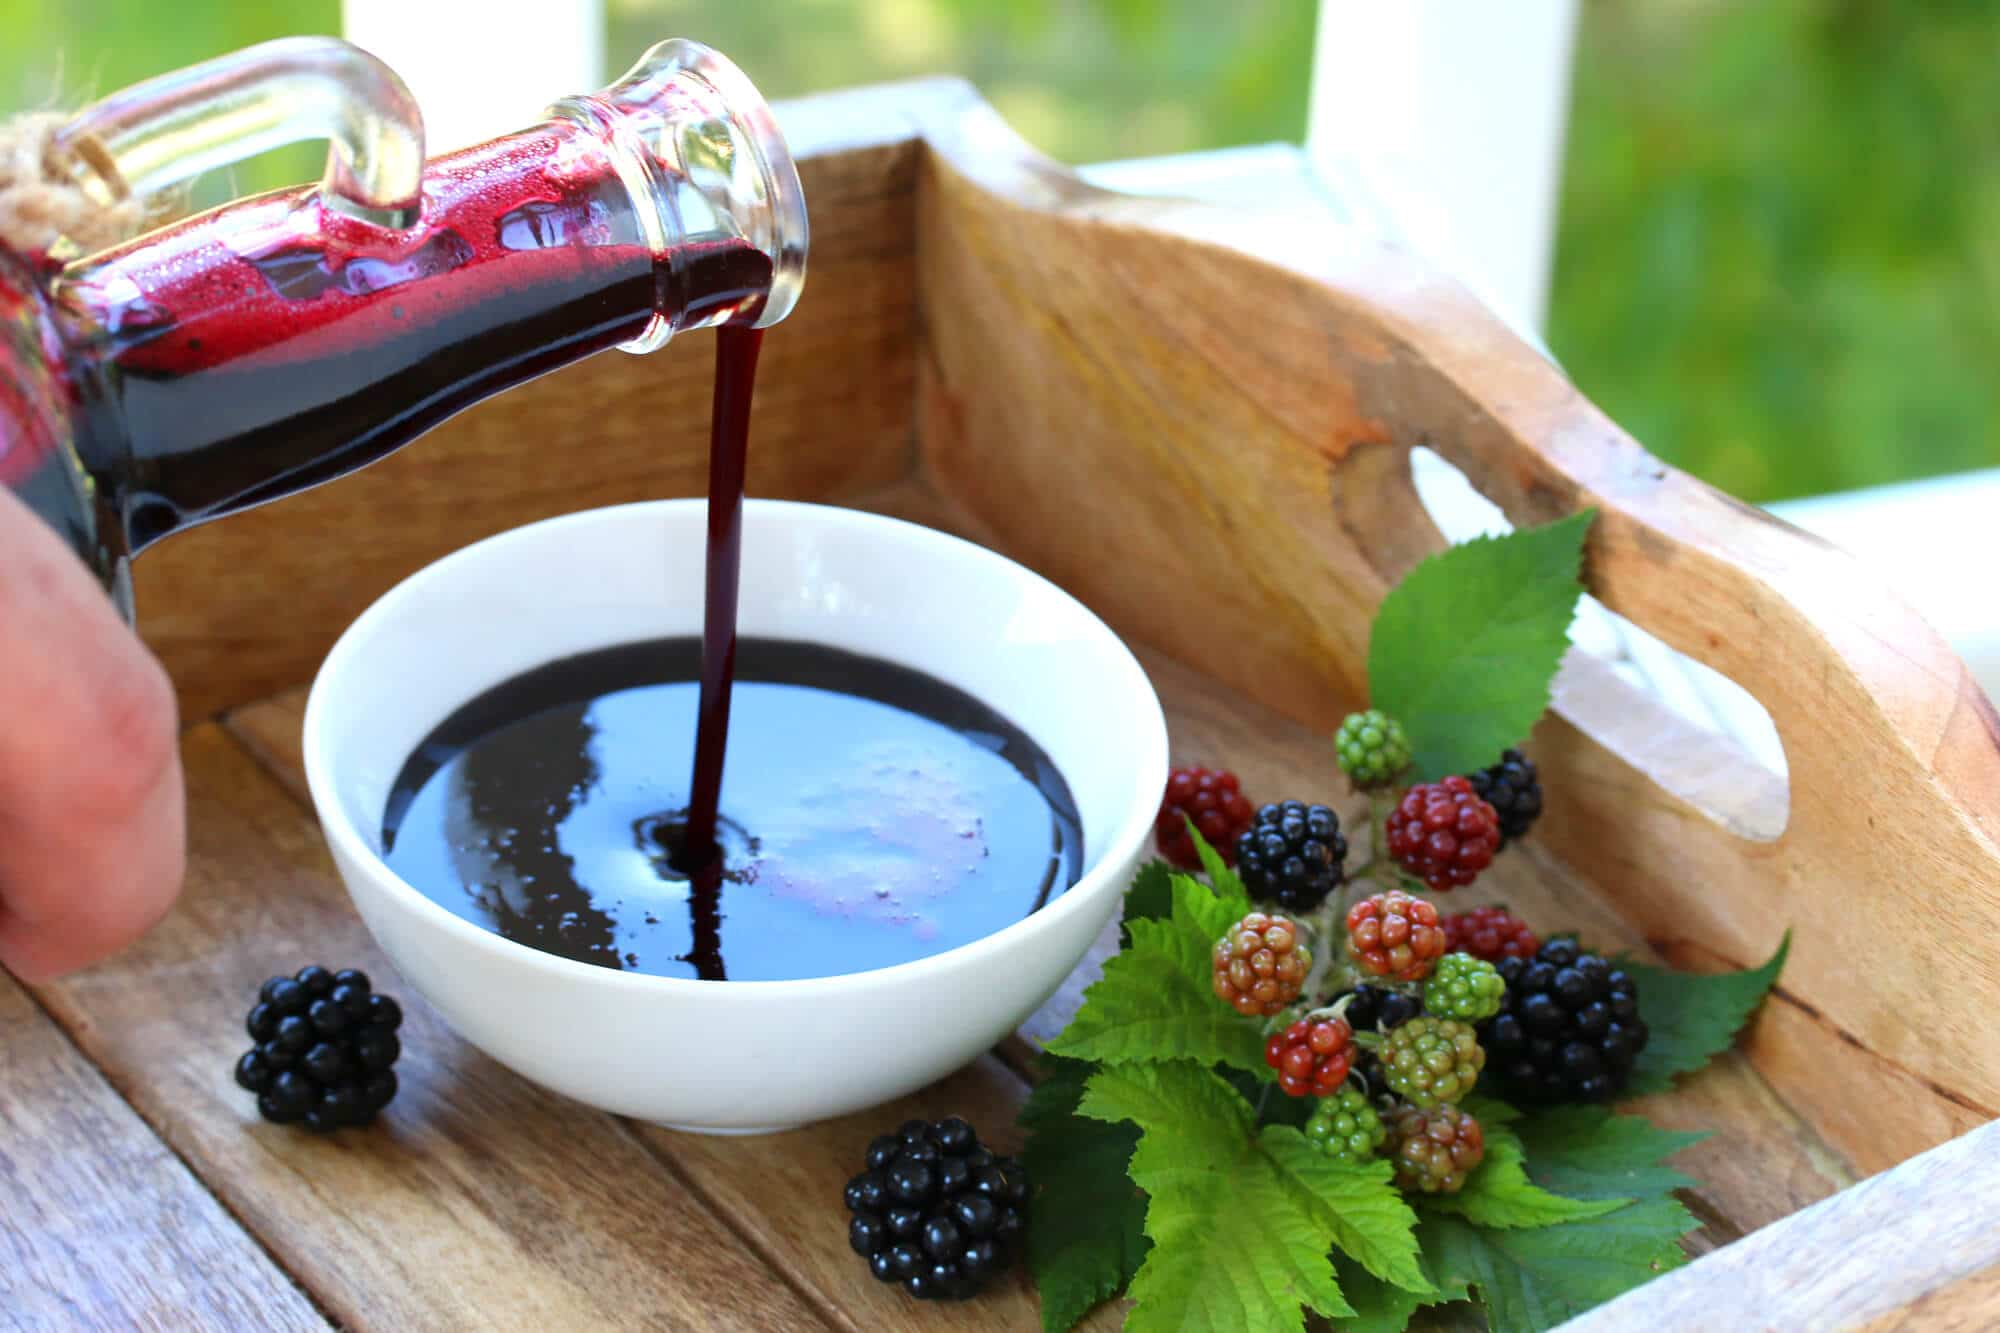 blackberry syrup recipe homemade